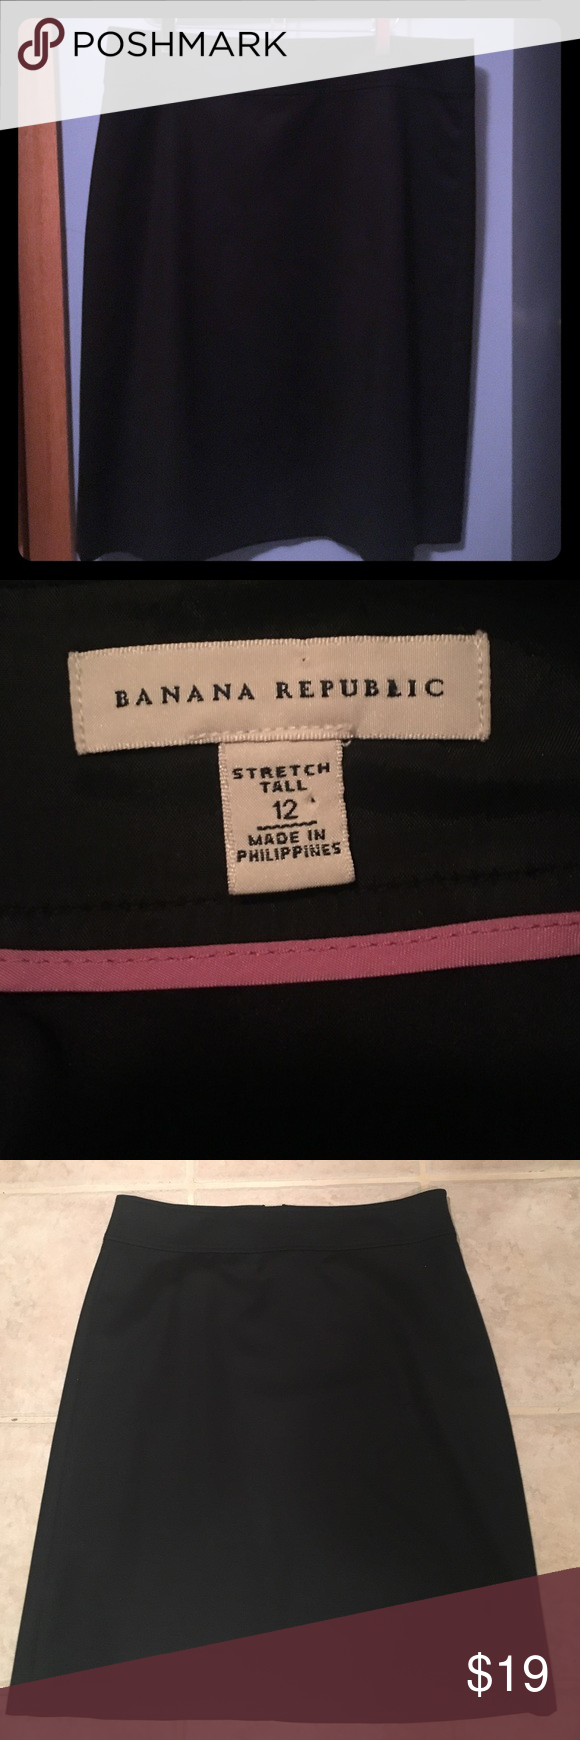 "Banana Republic black skirt Lined black skirt-gorgeous. Approx. 17"" waist, 20"" hips & measures 24"" top to bottom. Banana Republic Skirts Pencil"